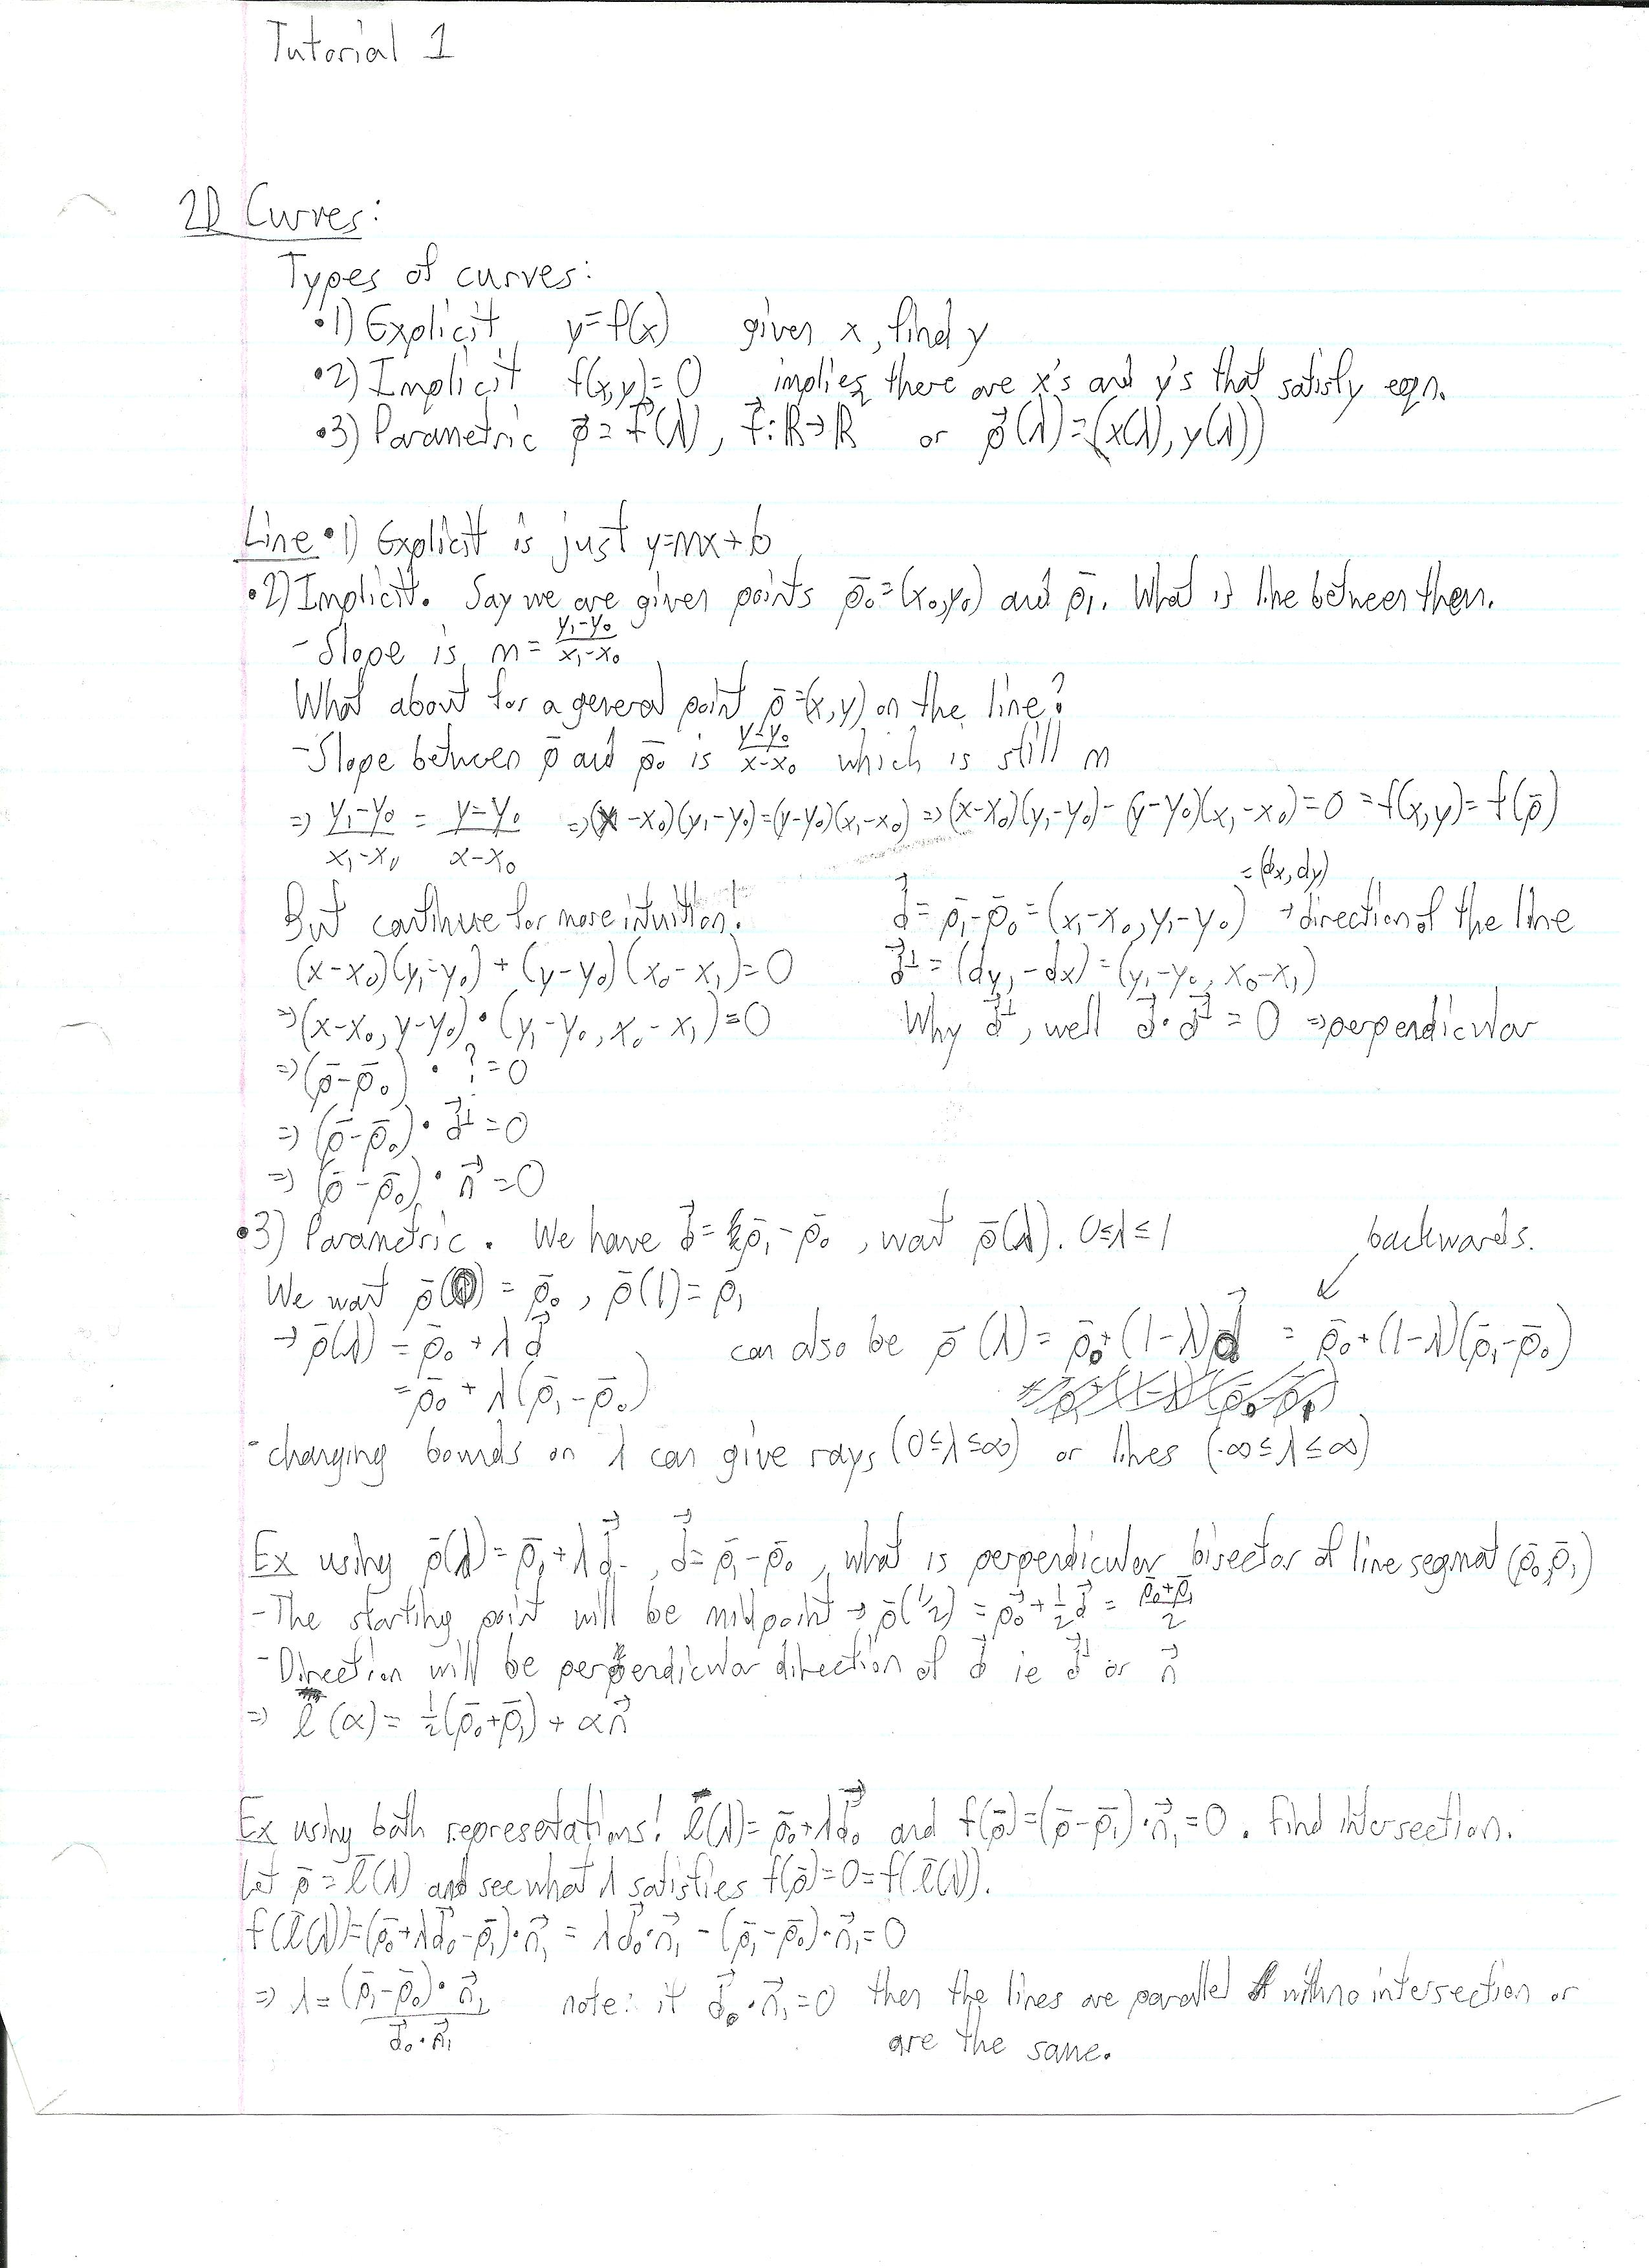 Bresenham Line Drawing Algorithm In Opengl : Liviu mihai calin